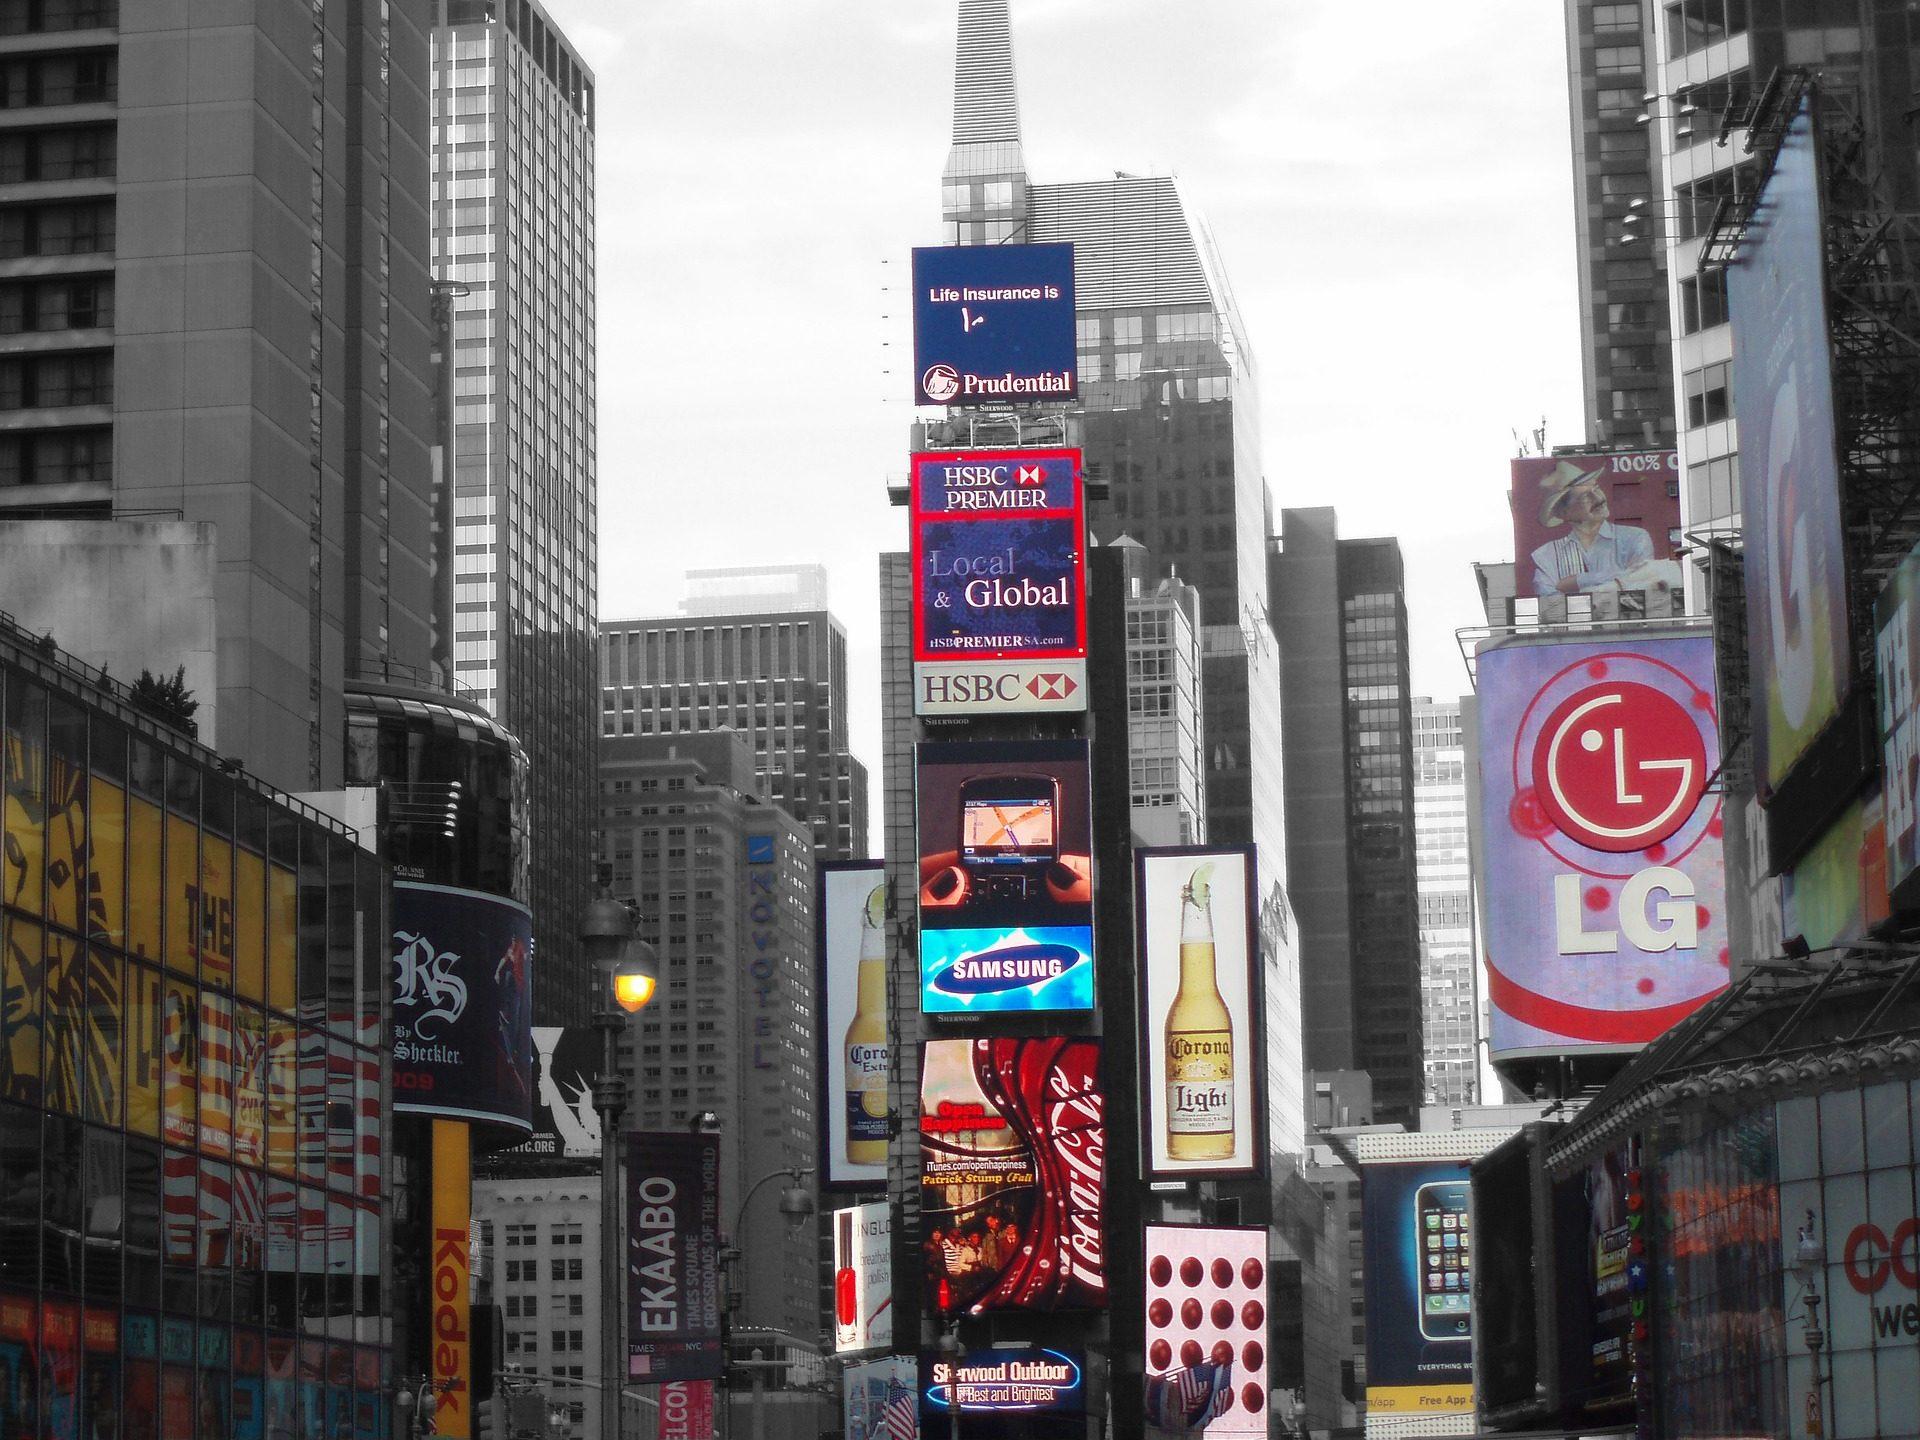 इमारतें, गगनचुंबी इमारत, anuncios, विज्ञापन, शहर - HD वॉलपेपर - प्रोफेसर-falken.com